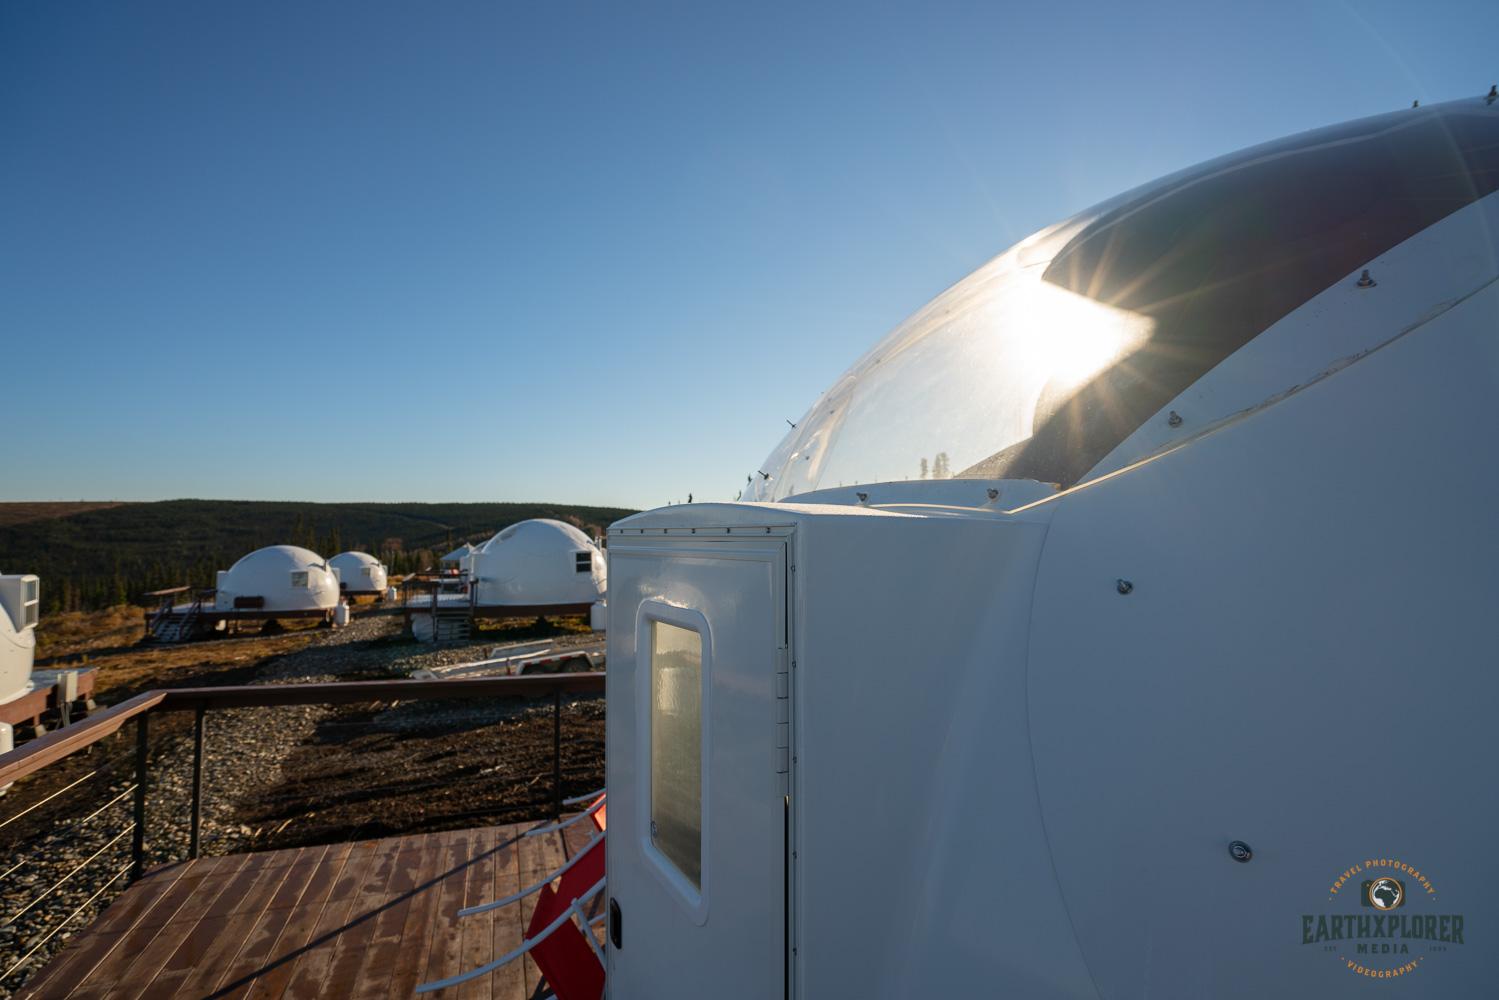 borealis base camp-3.jpg